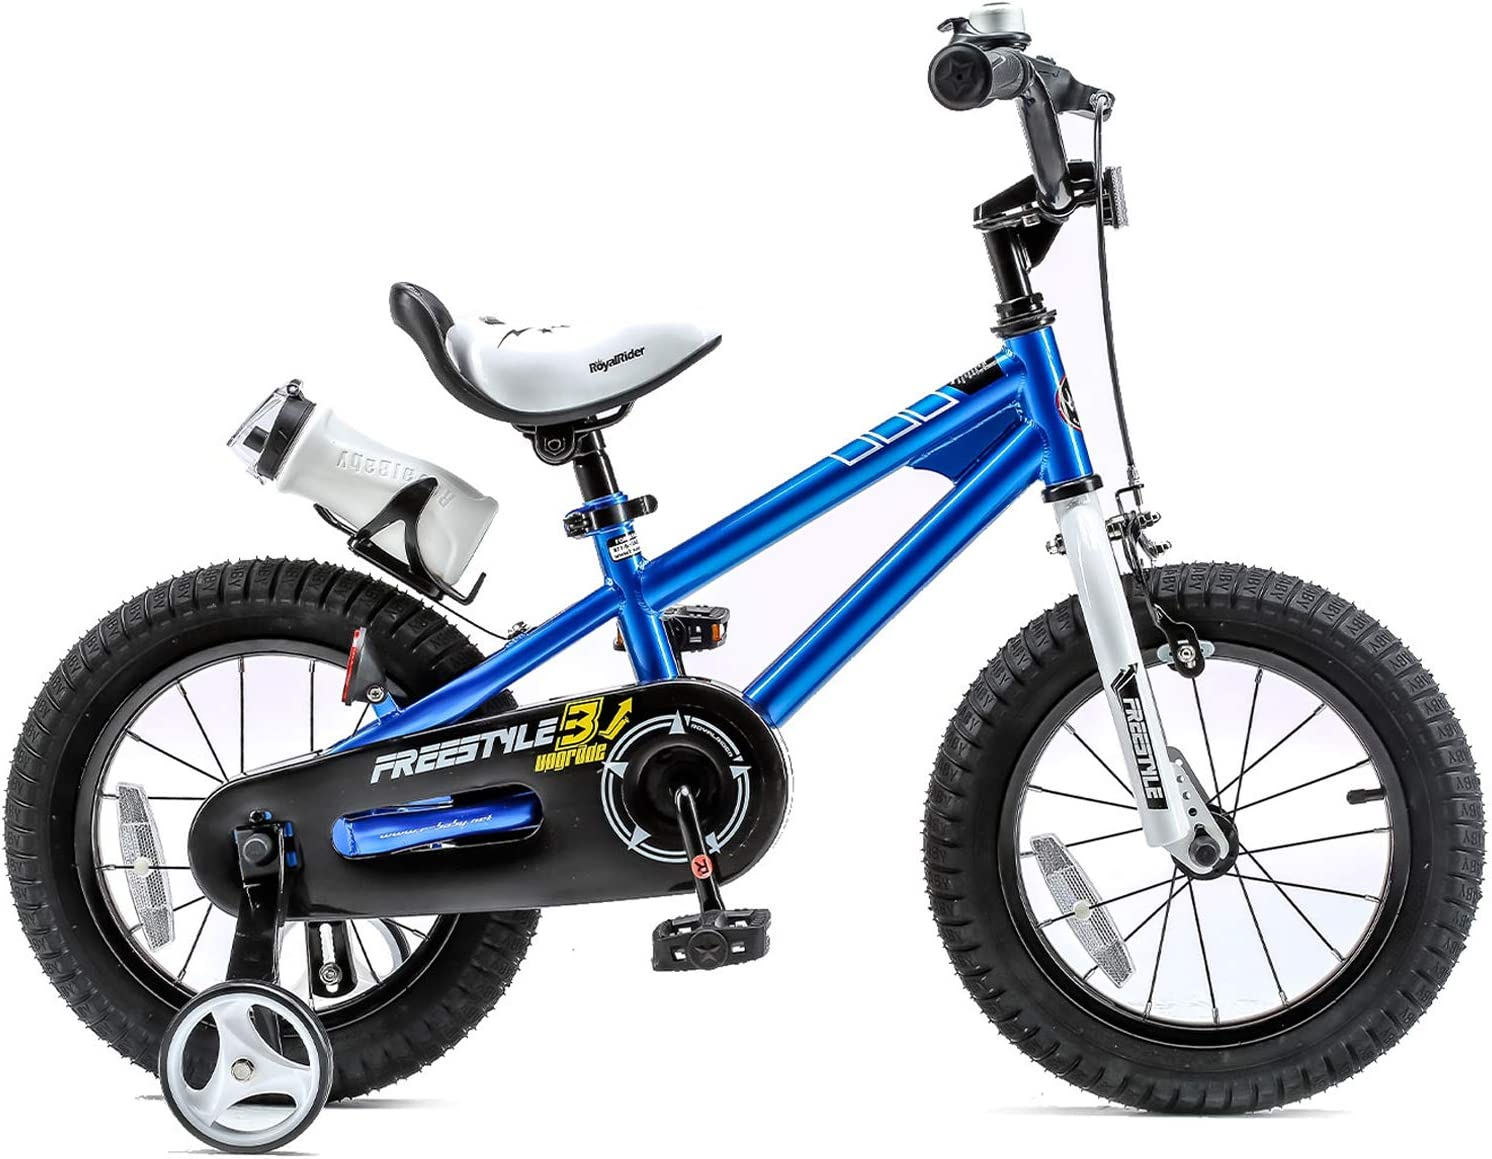 avec Formation Roues Royalbaby Kids Bike garçons filles Freestyle Vélo 14 in environ 35.56 cm